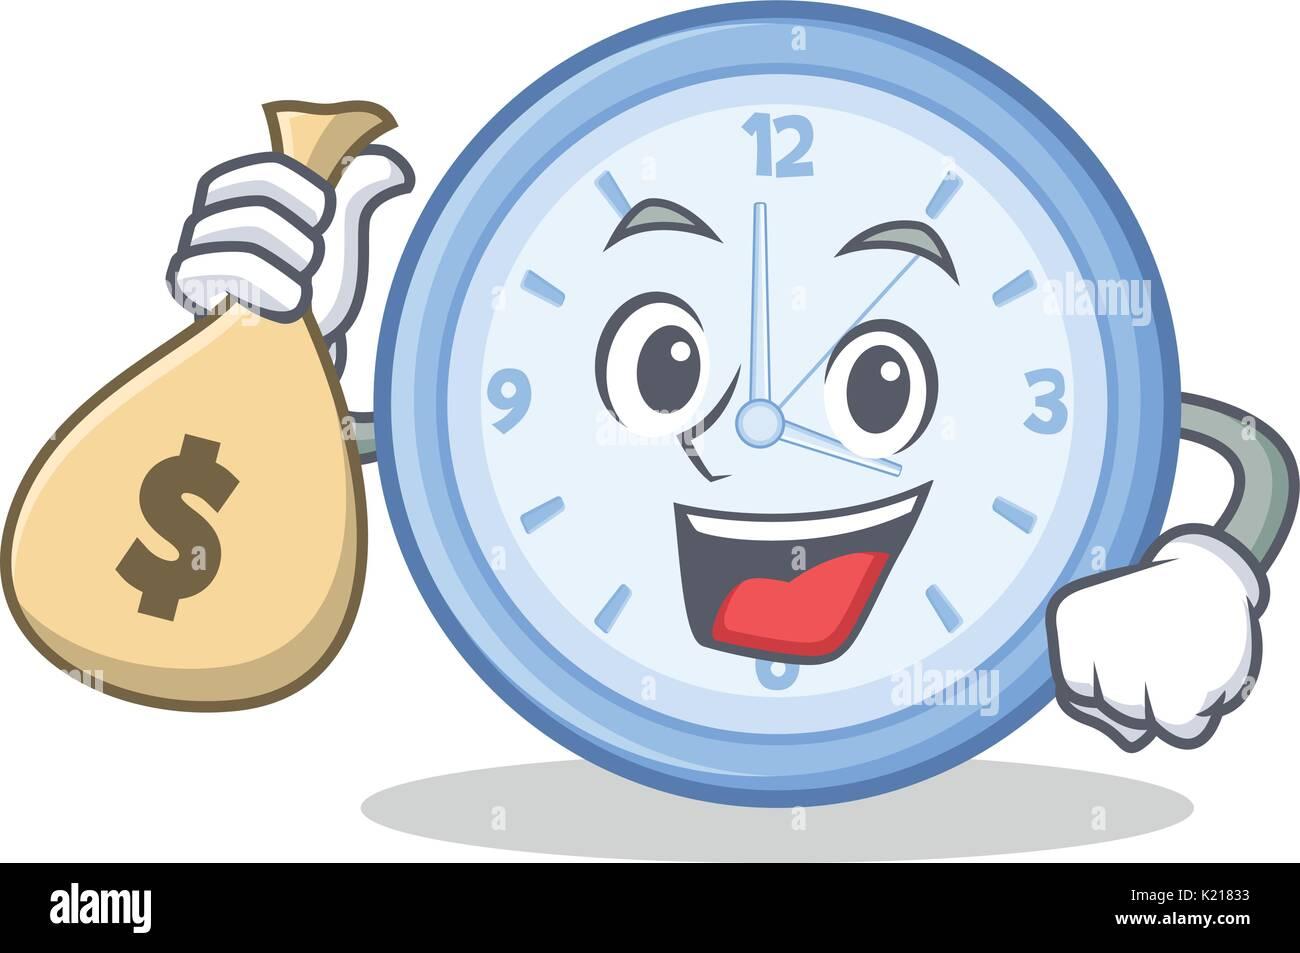 Bolsa De Dinero Con Carácter De Reloj Estilo De Dibujos